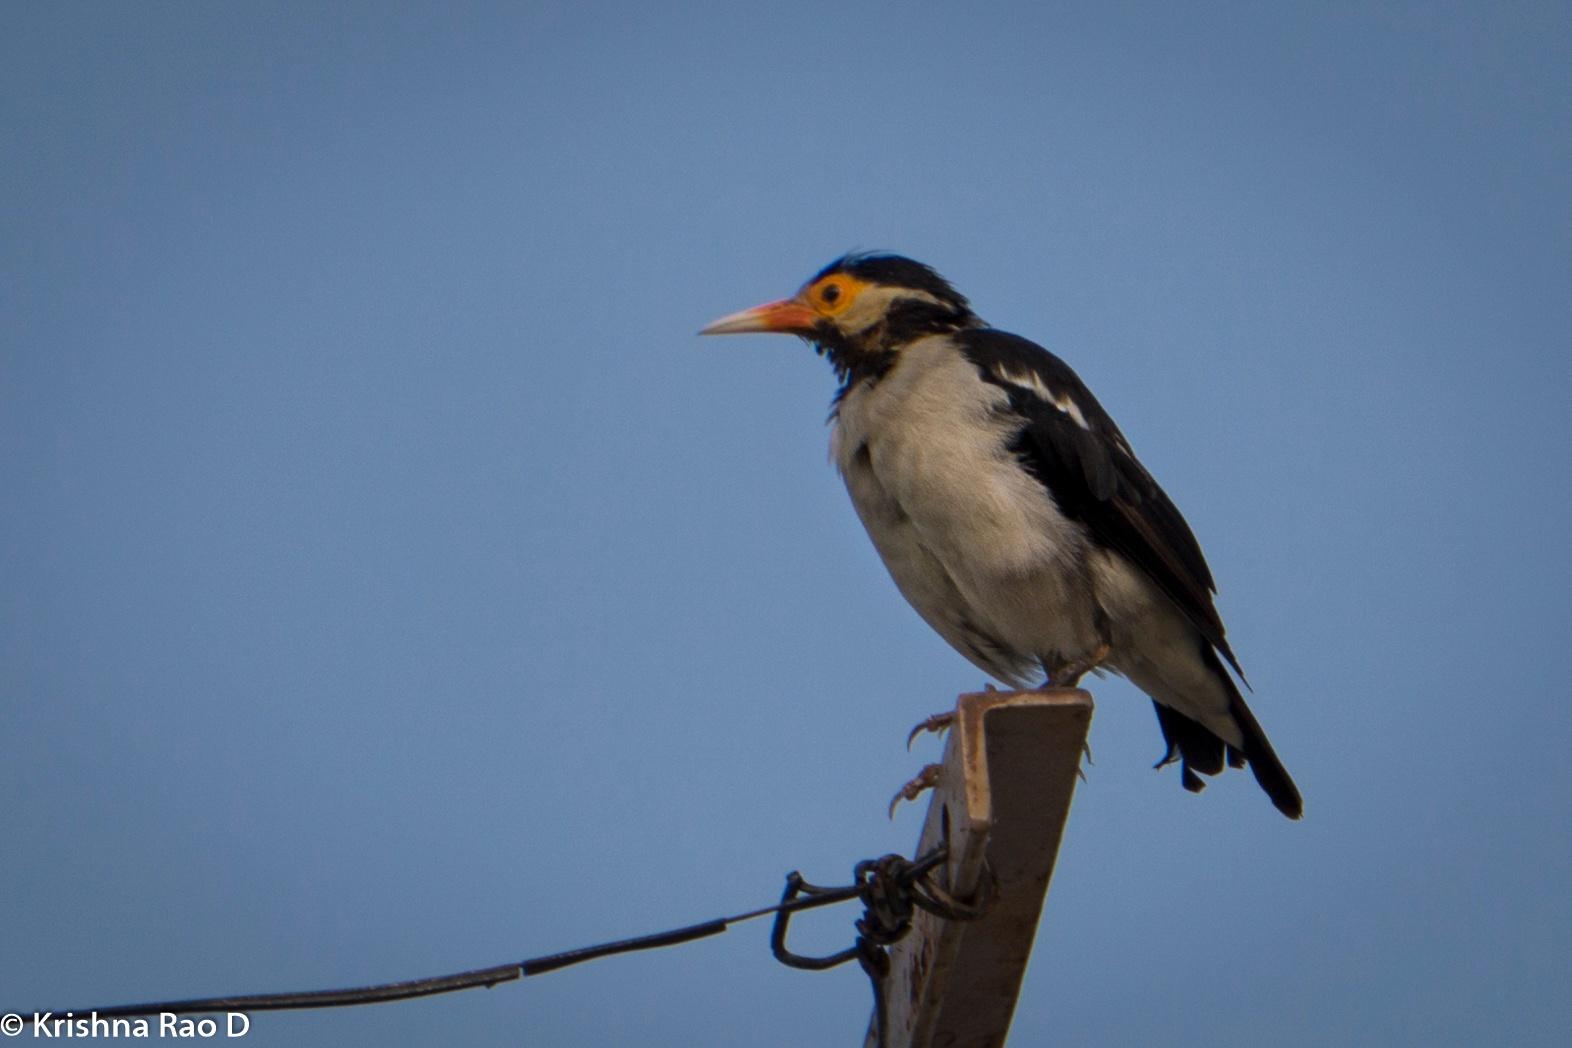 bird by Krishna Rao D